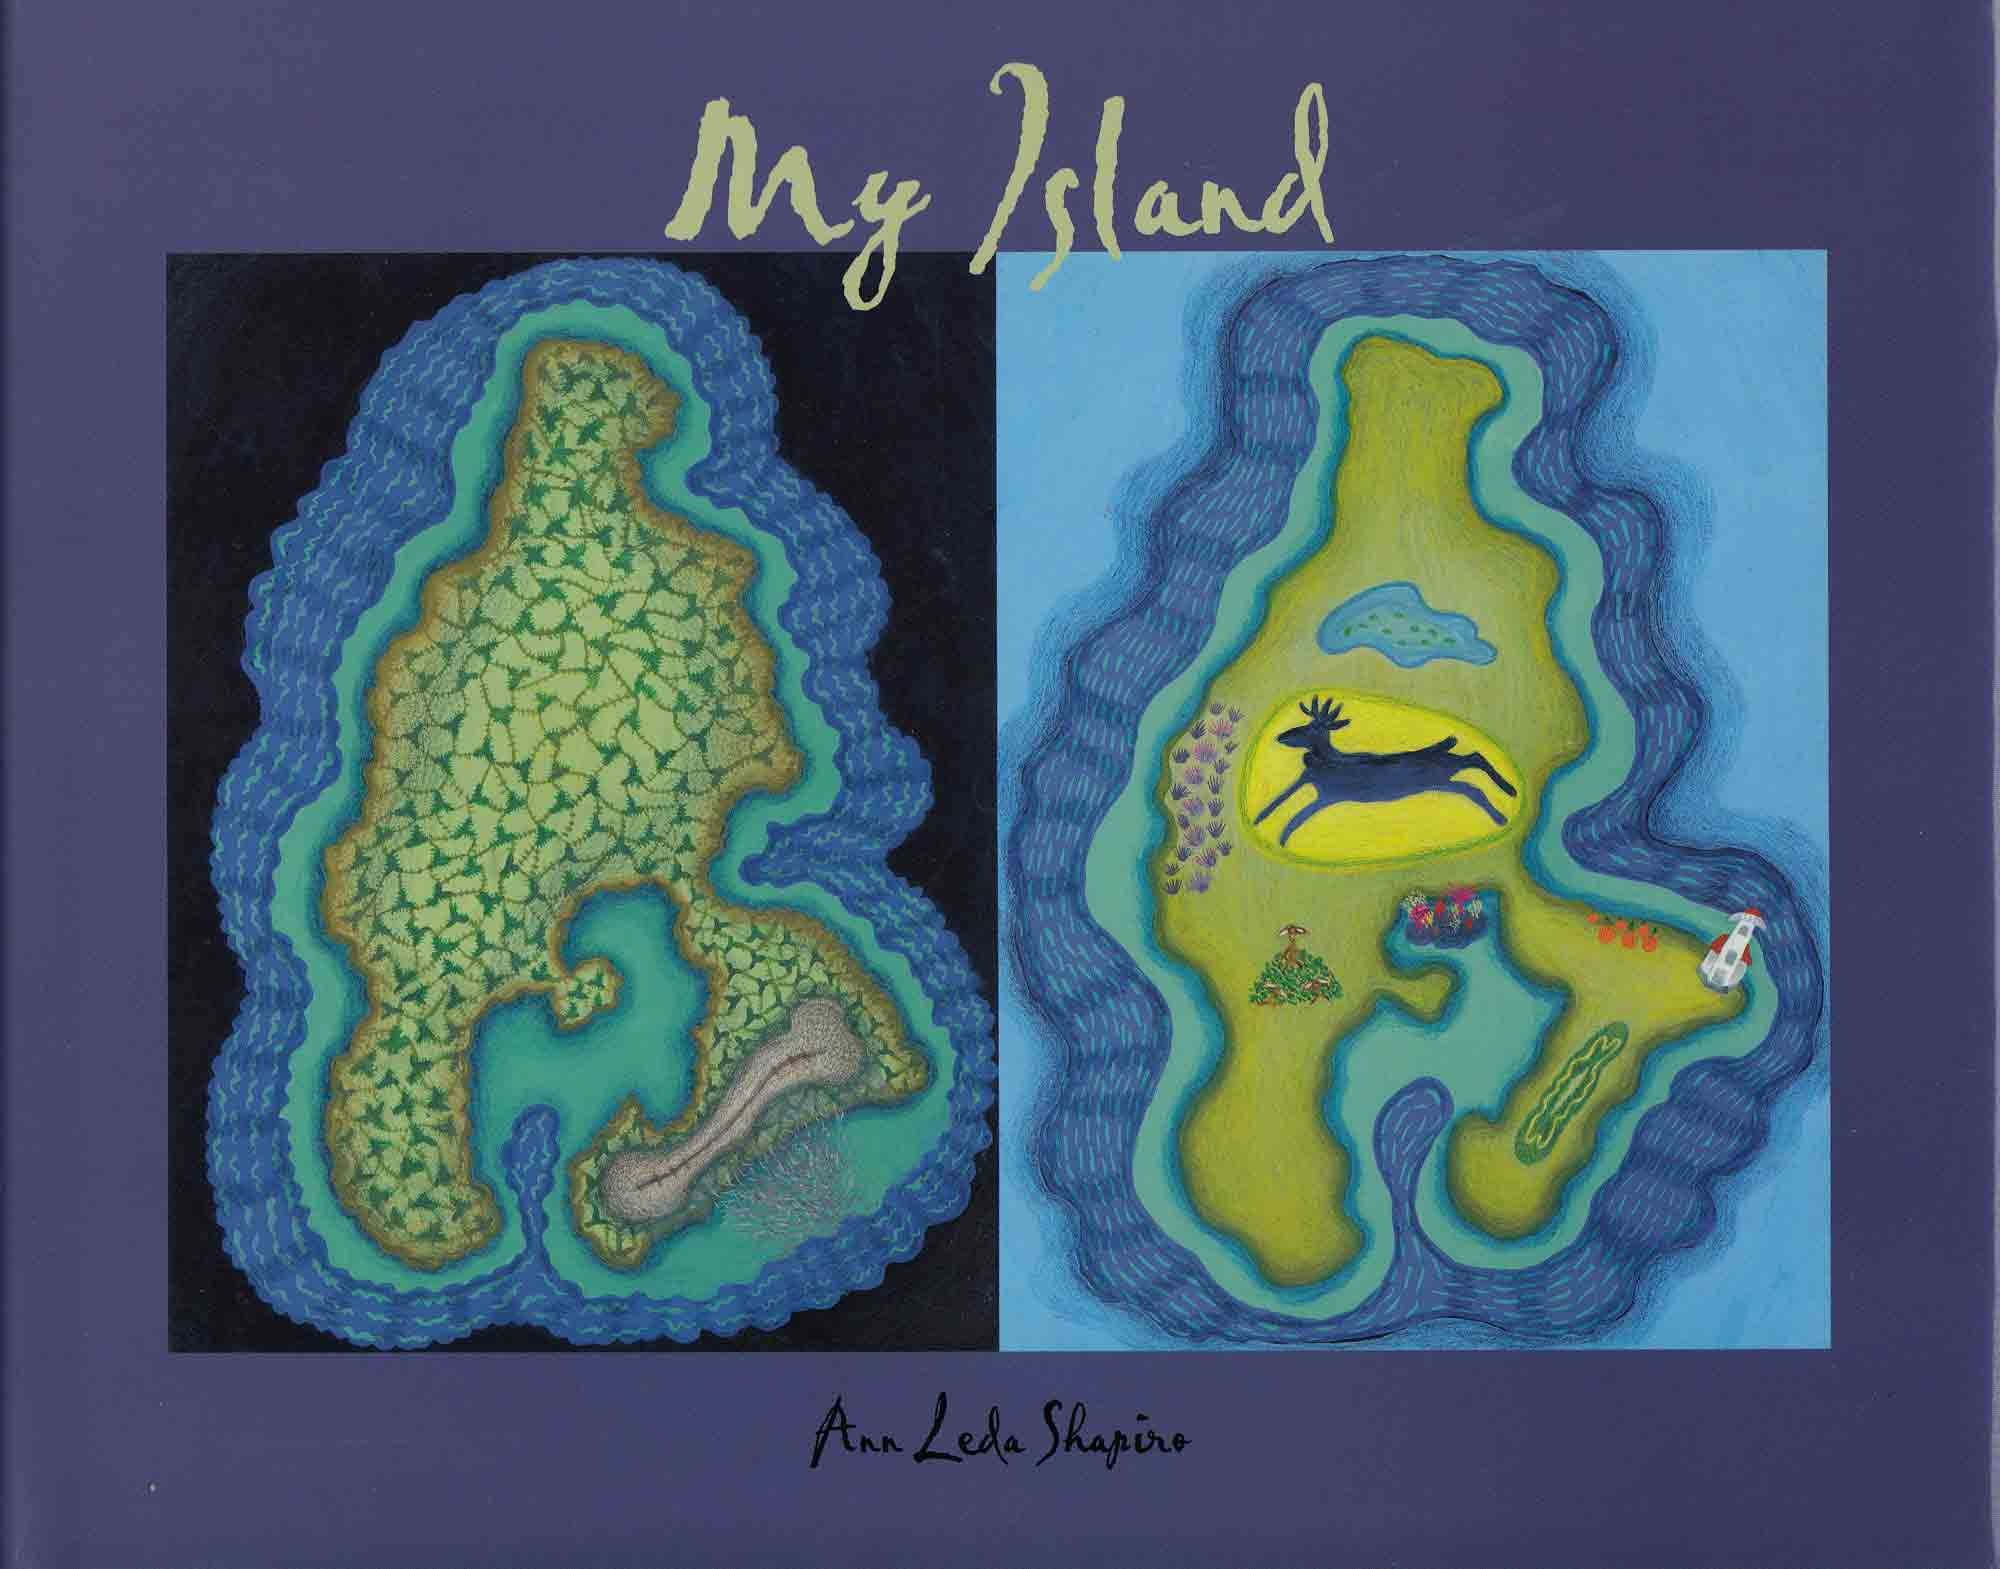 My Island, Ann Leda Shapiro